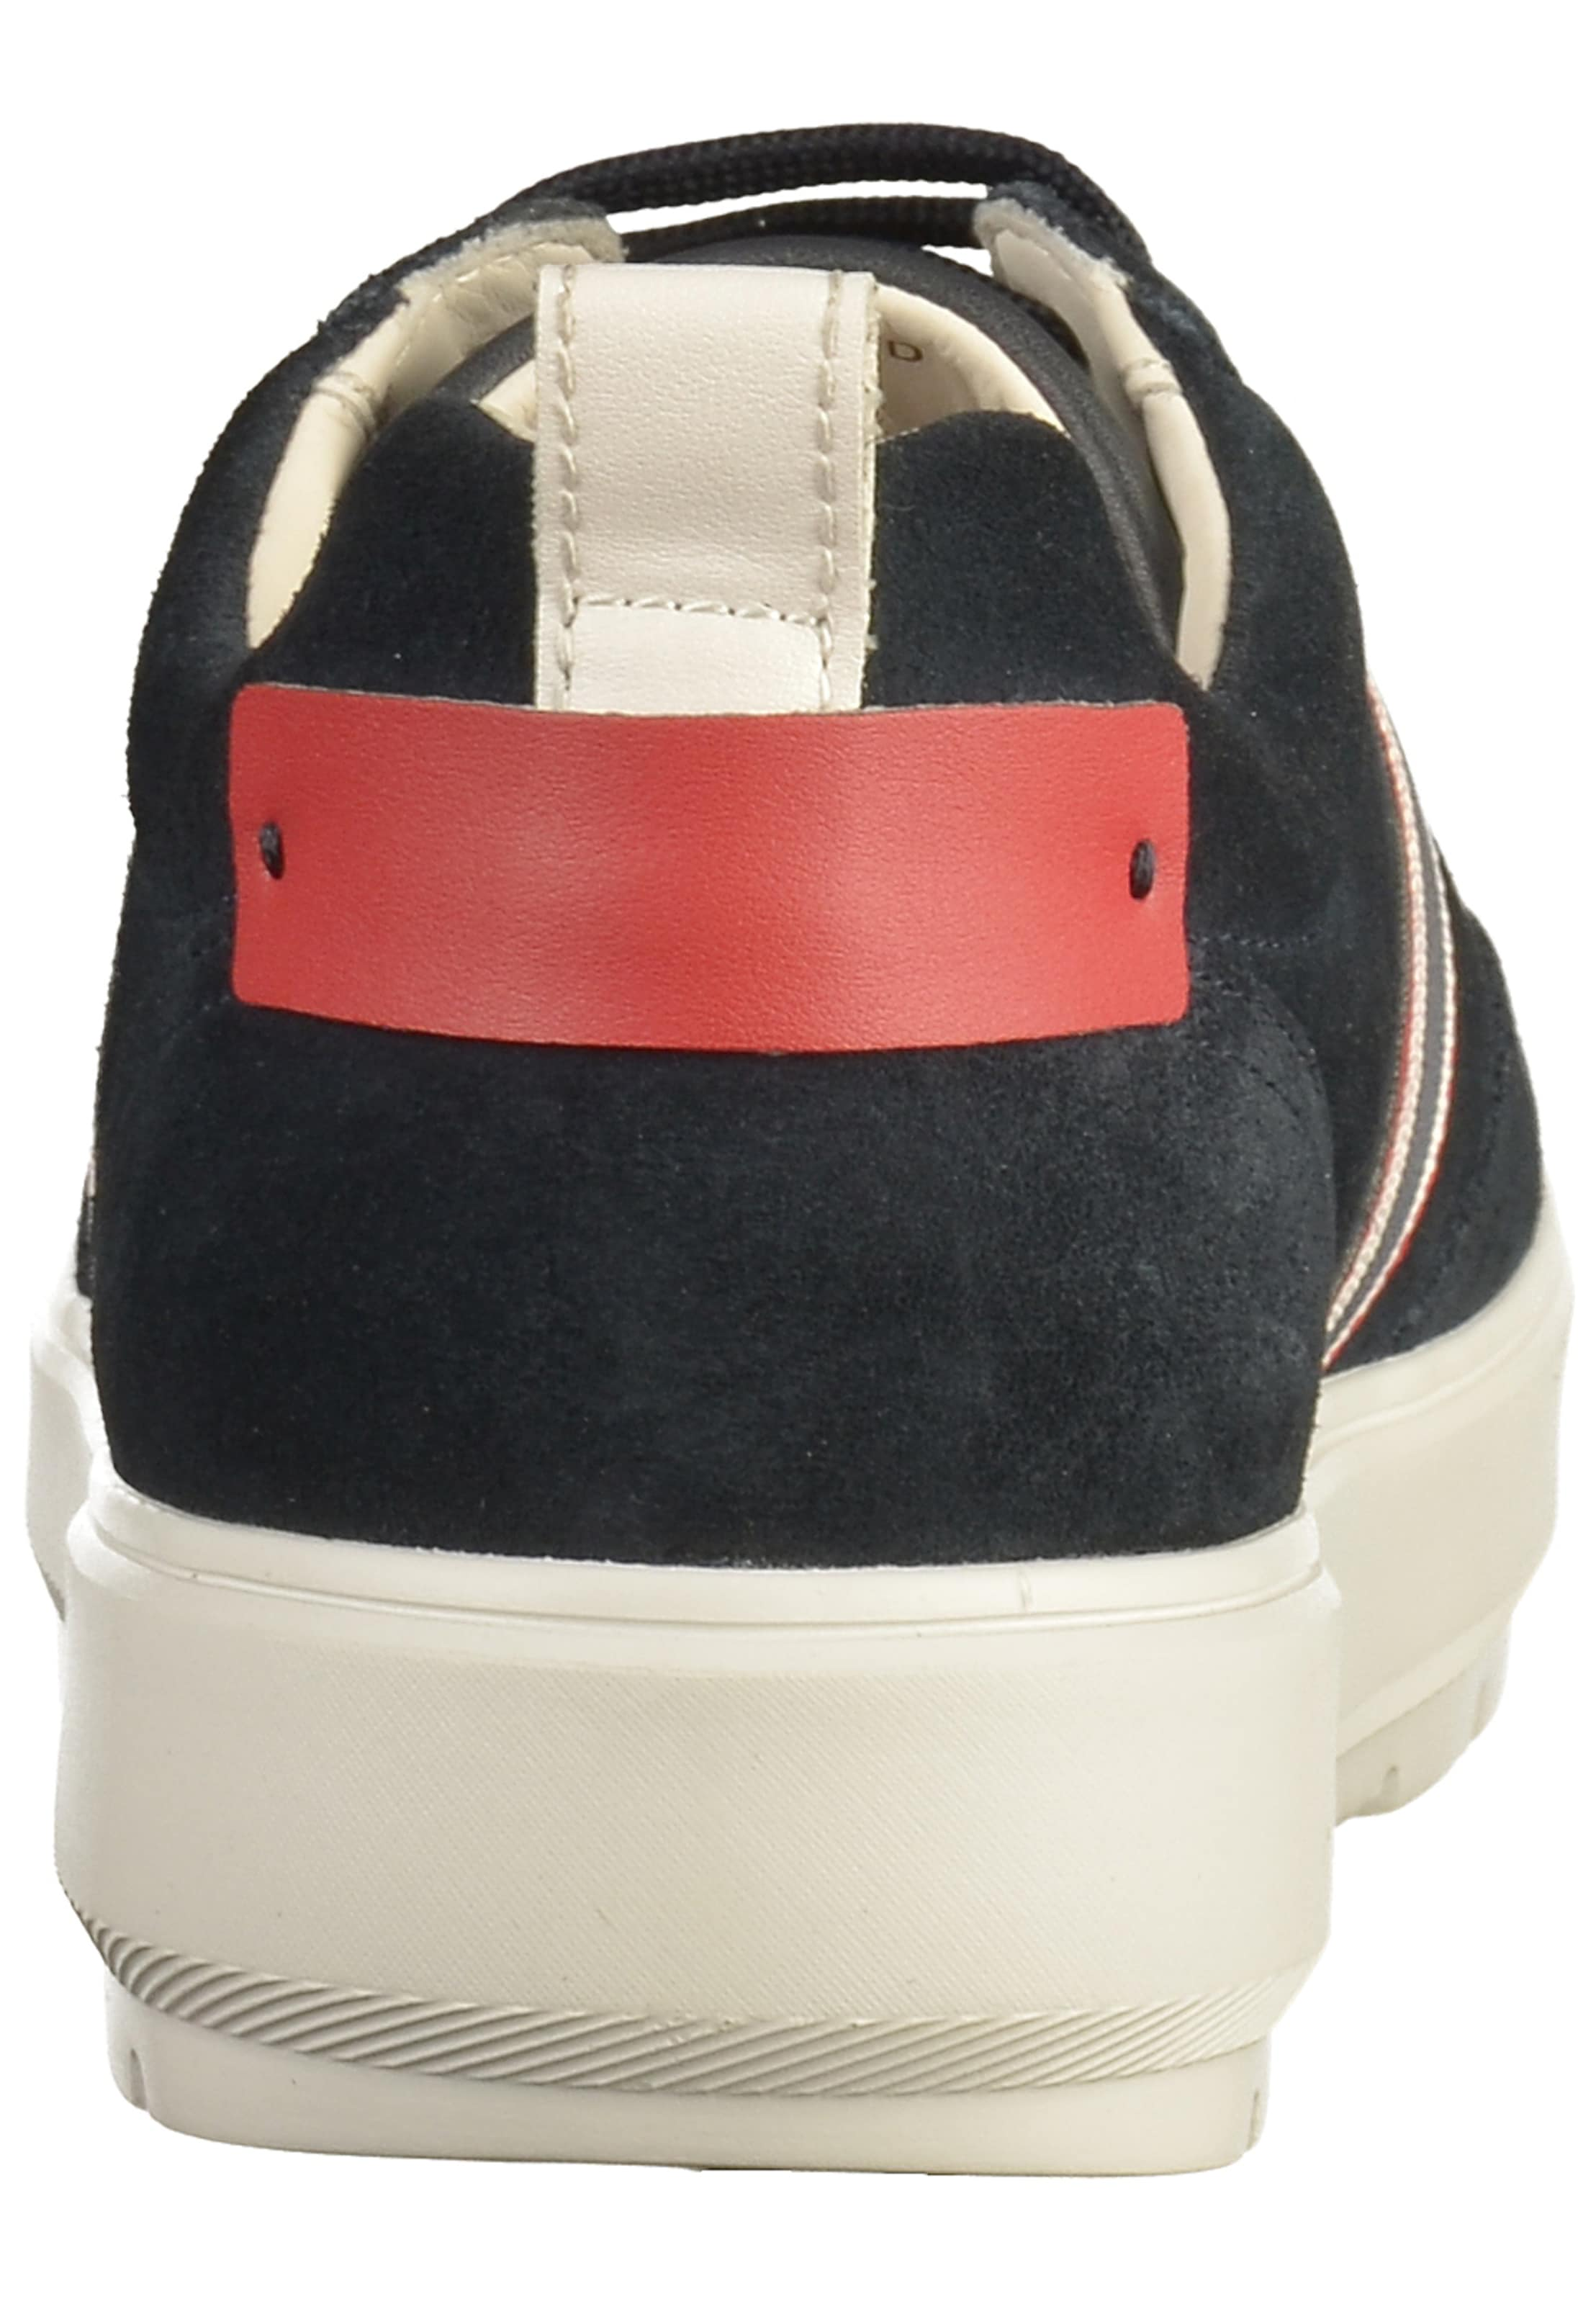 Laag Geox In NachtblauwRood Wit Sneakers TlF31KuJc